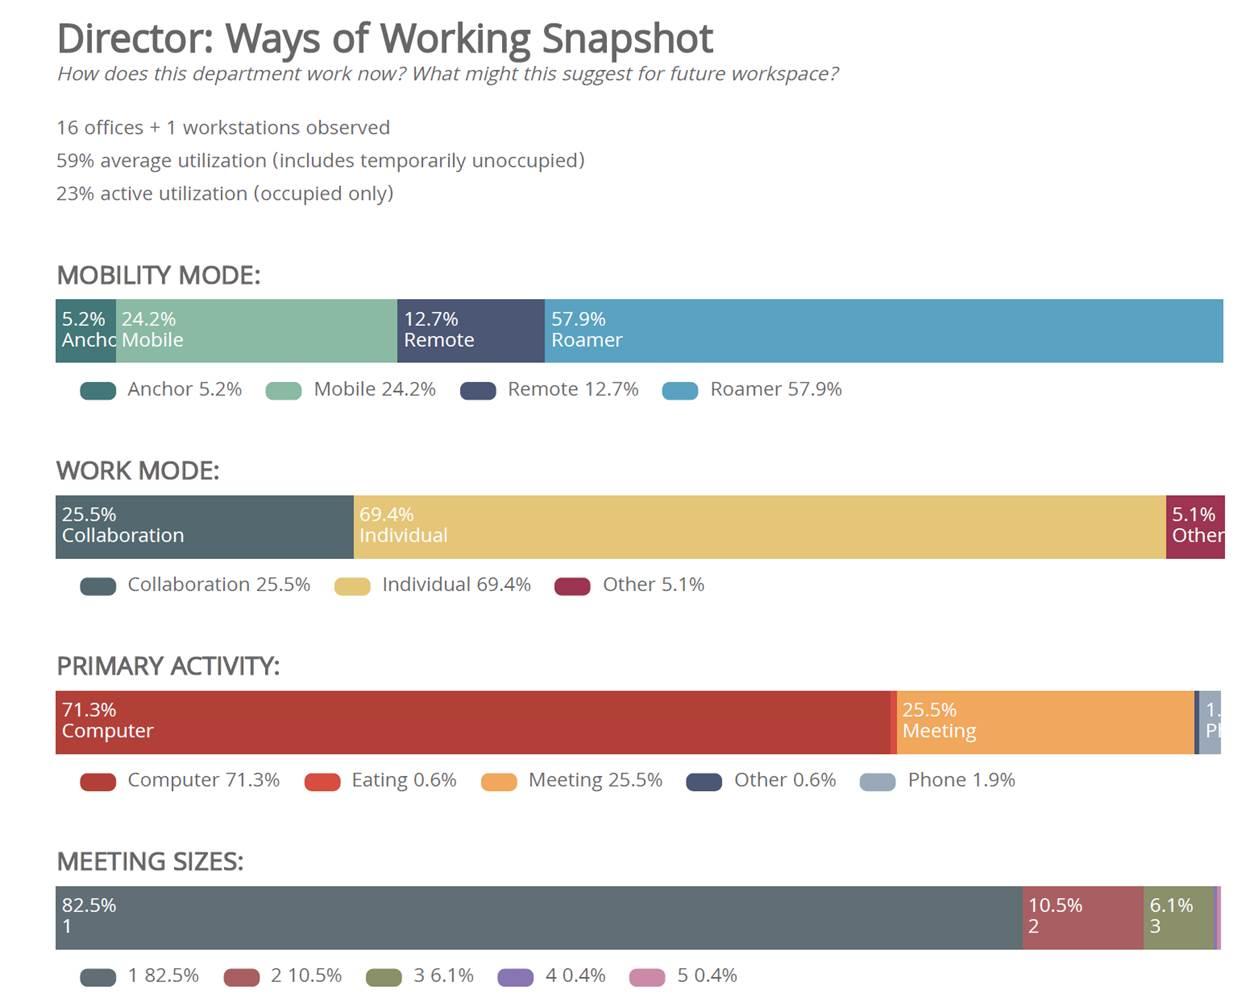 Ways of working